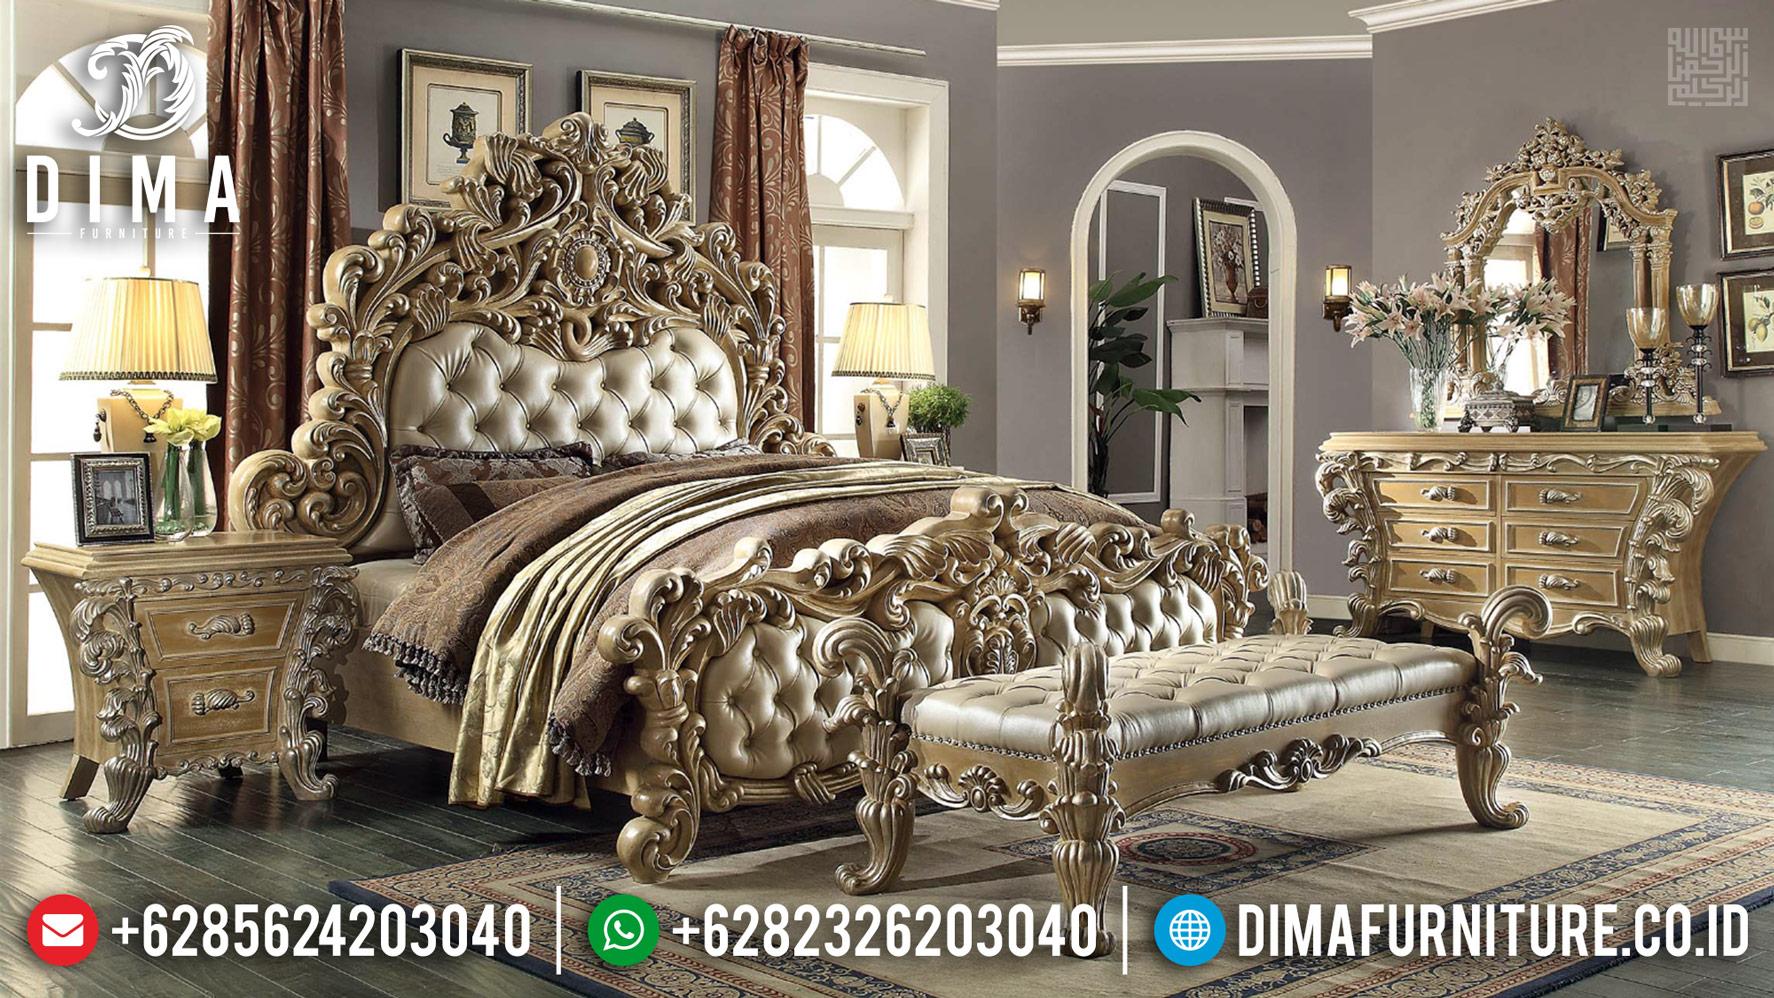 Harga Tempat Tidur Mewah Full Ukiran Luxury Asli Jepara TTJ-0427